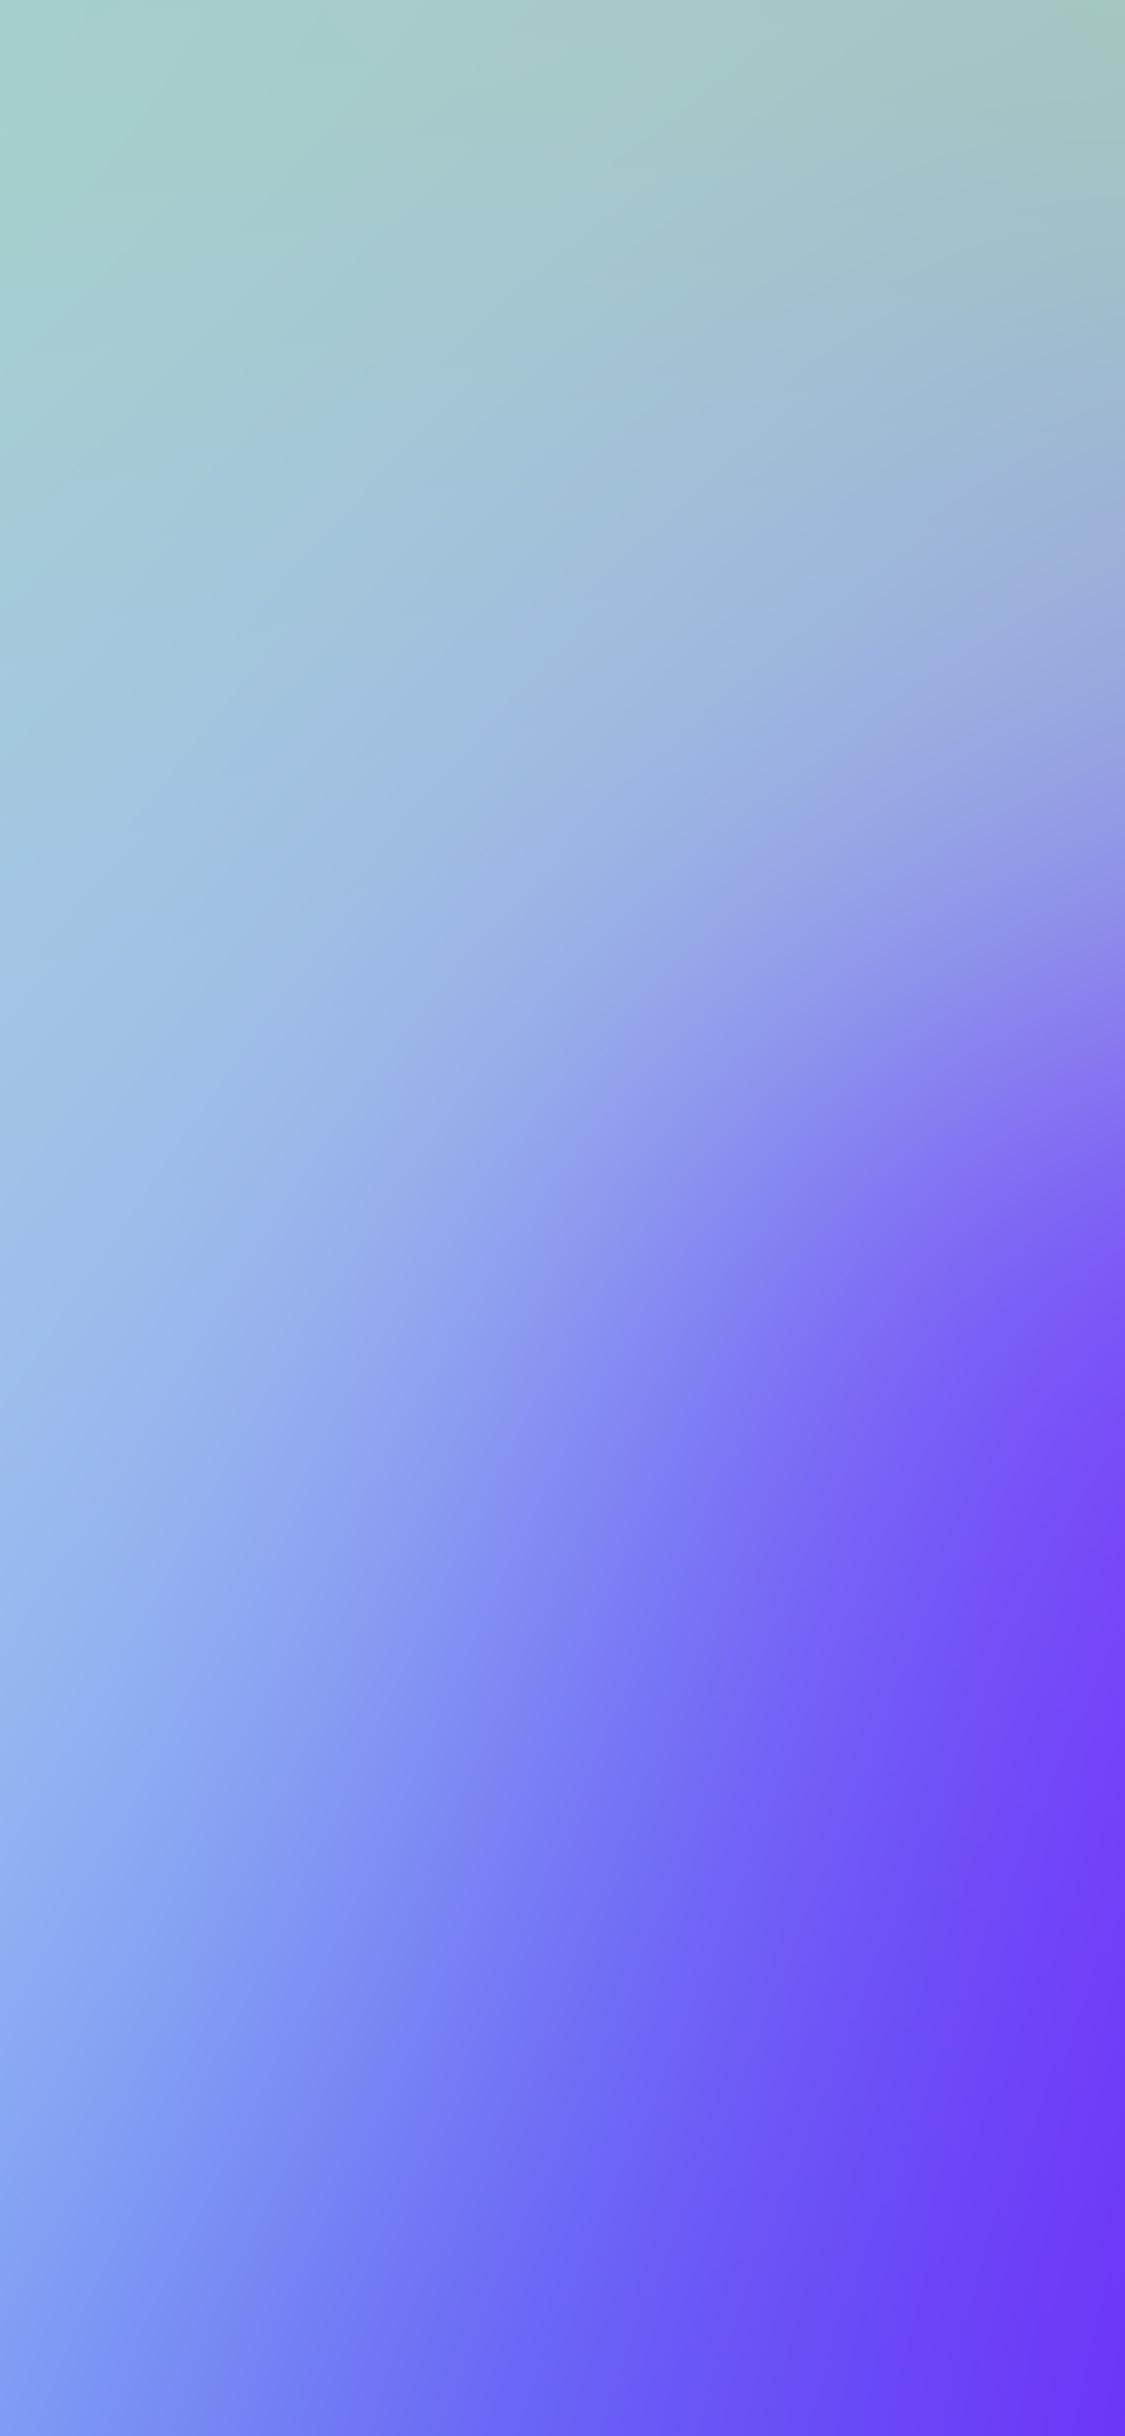 iPhonexpapers.com-Apple-iPhone-wallpaper-so32-blur-gradation-blue-purple